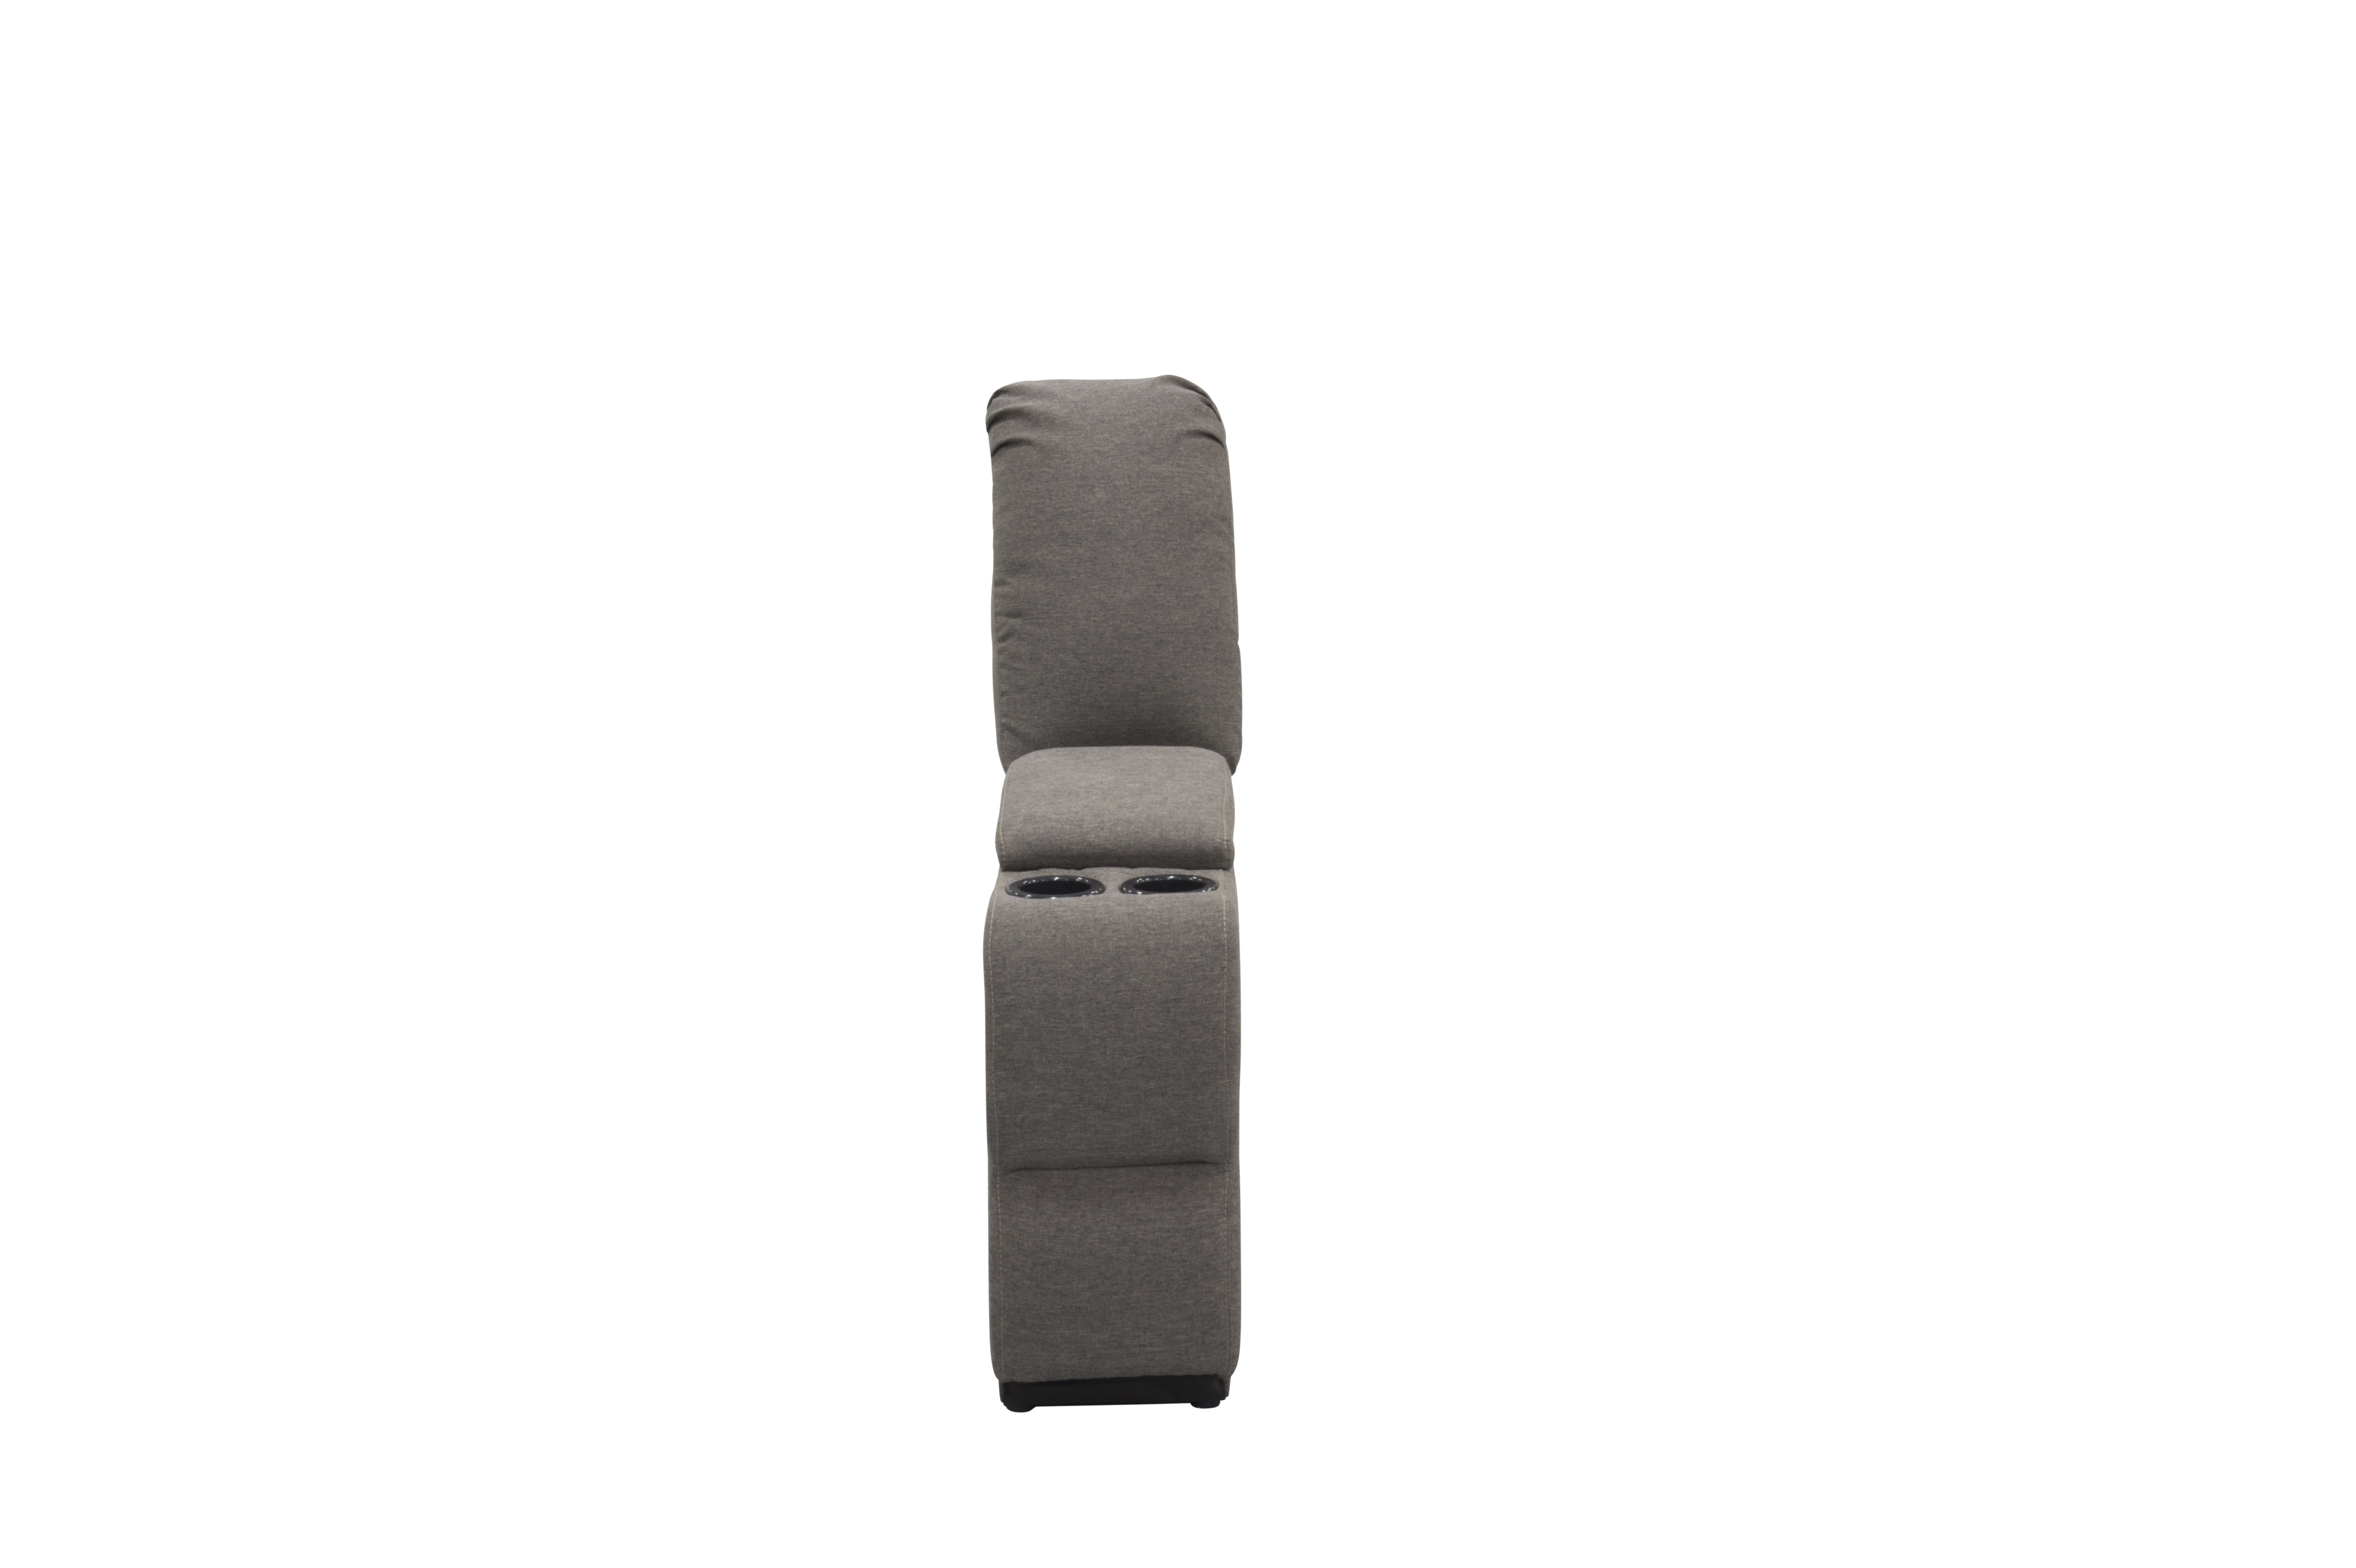 Lippert Components 643642 Console Thomas Payne Furniture Sofa Center